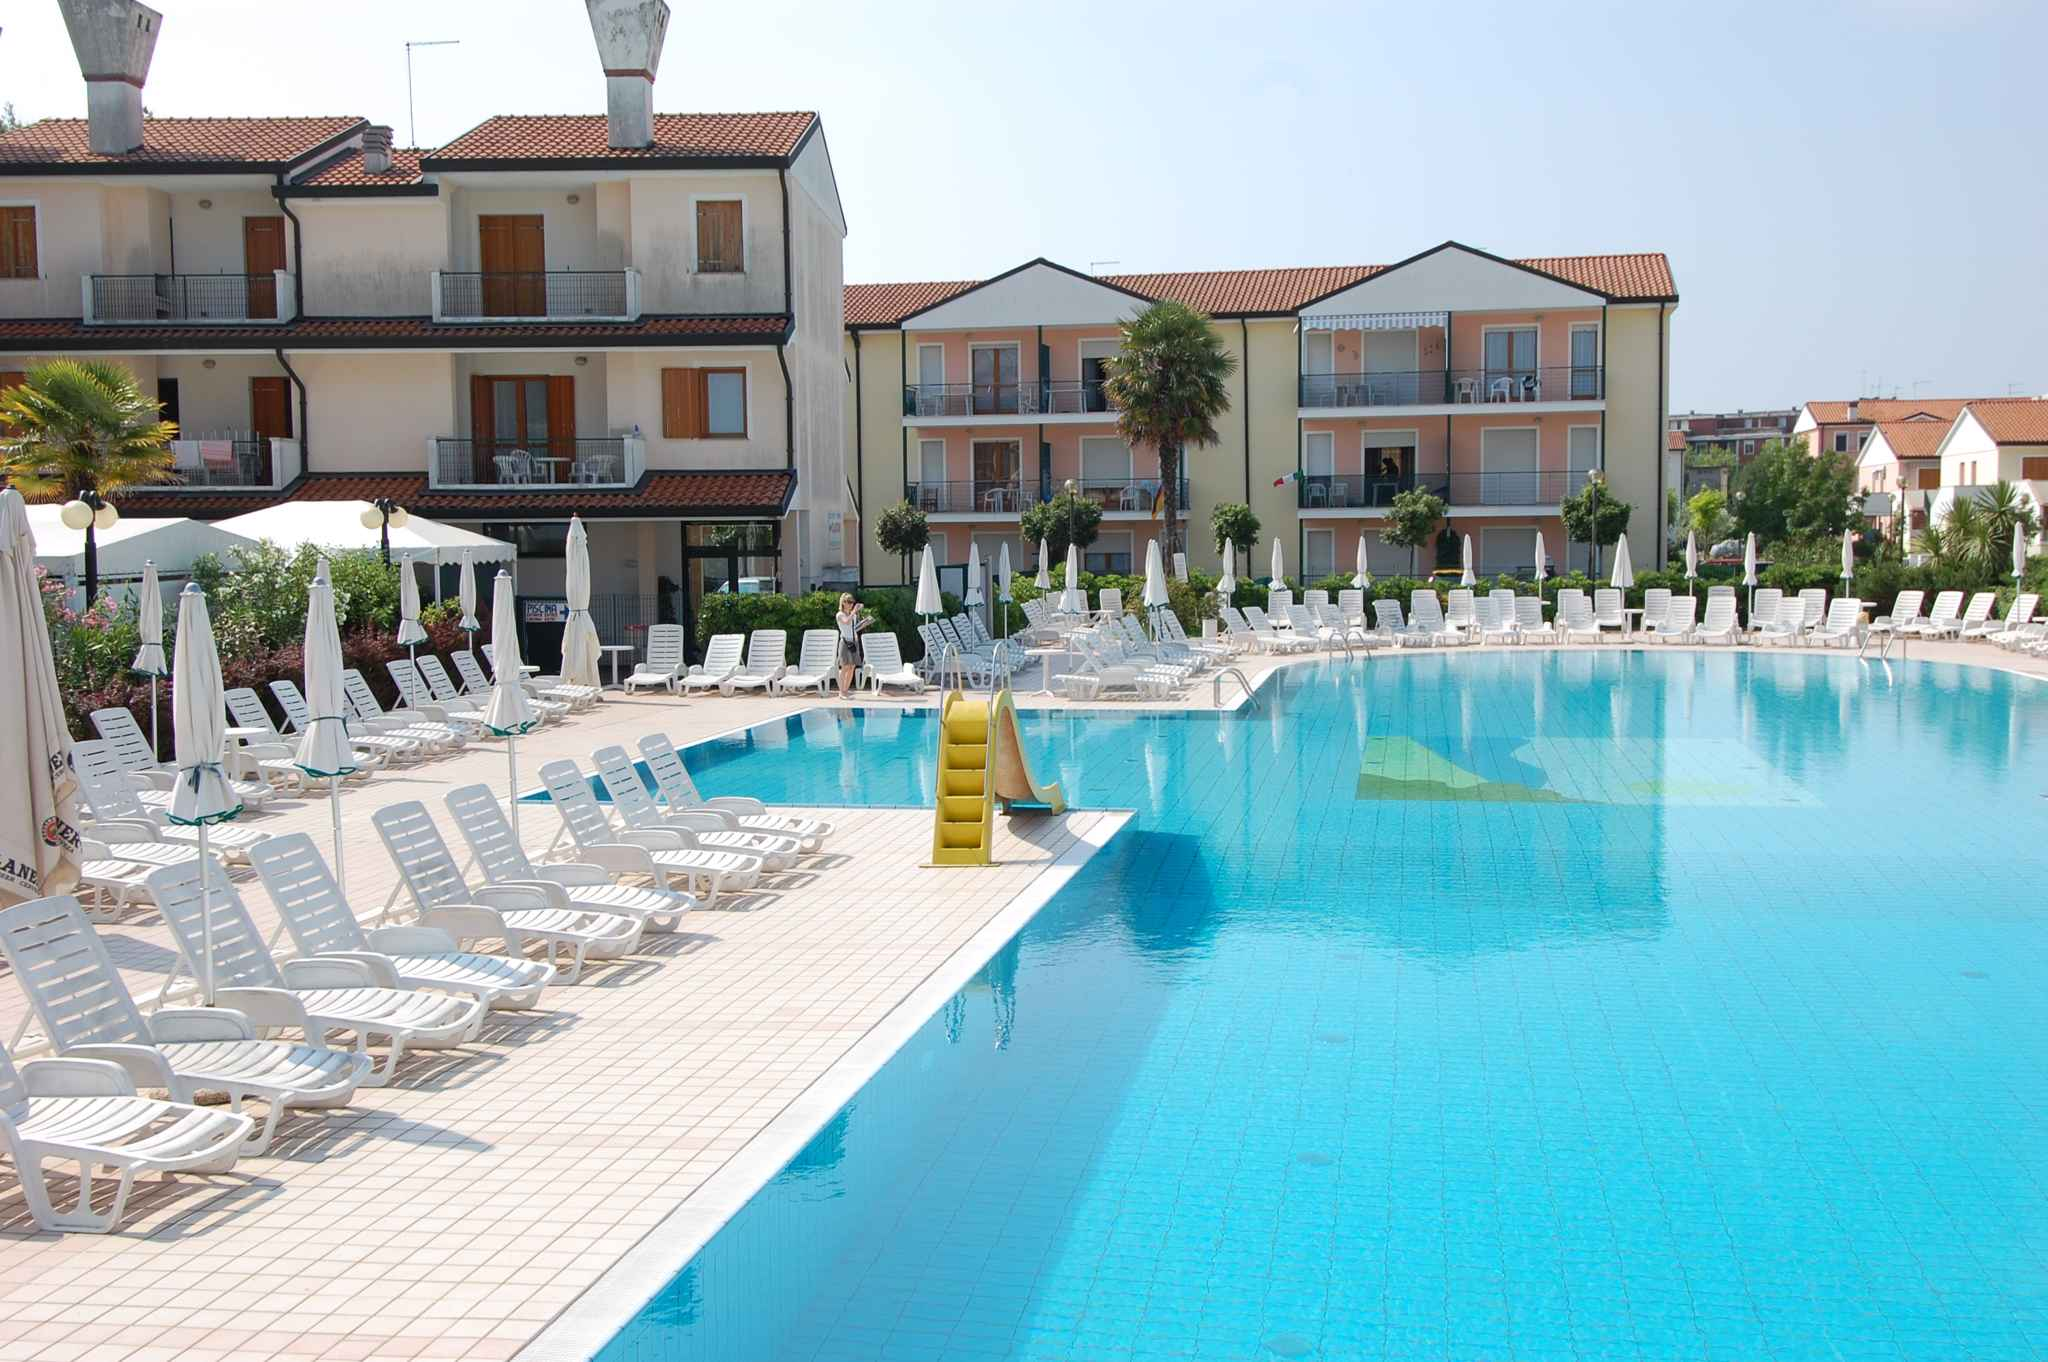 Ferienhaus mit Pool und Grill (284304), Rosolina Mare, Rovigo, Venetien, Italien, Bild 14